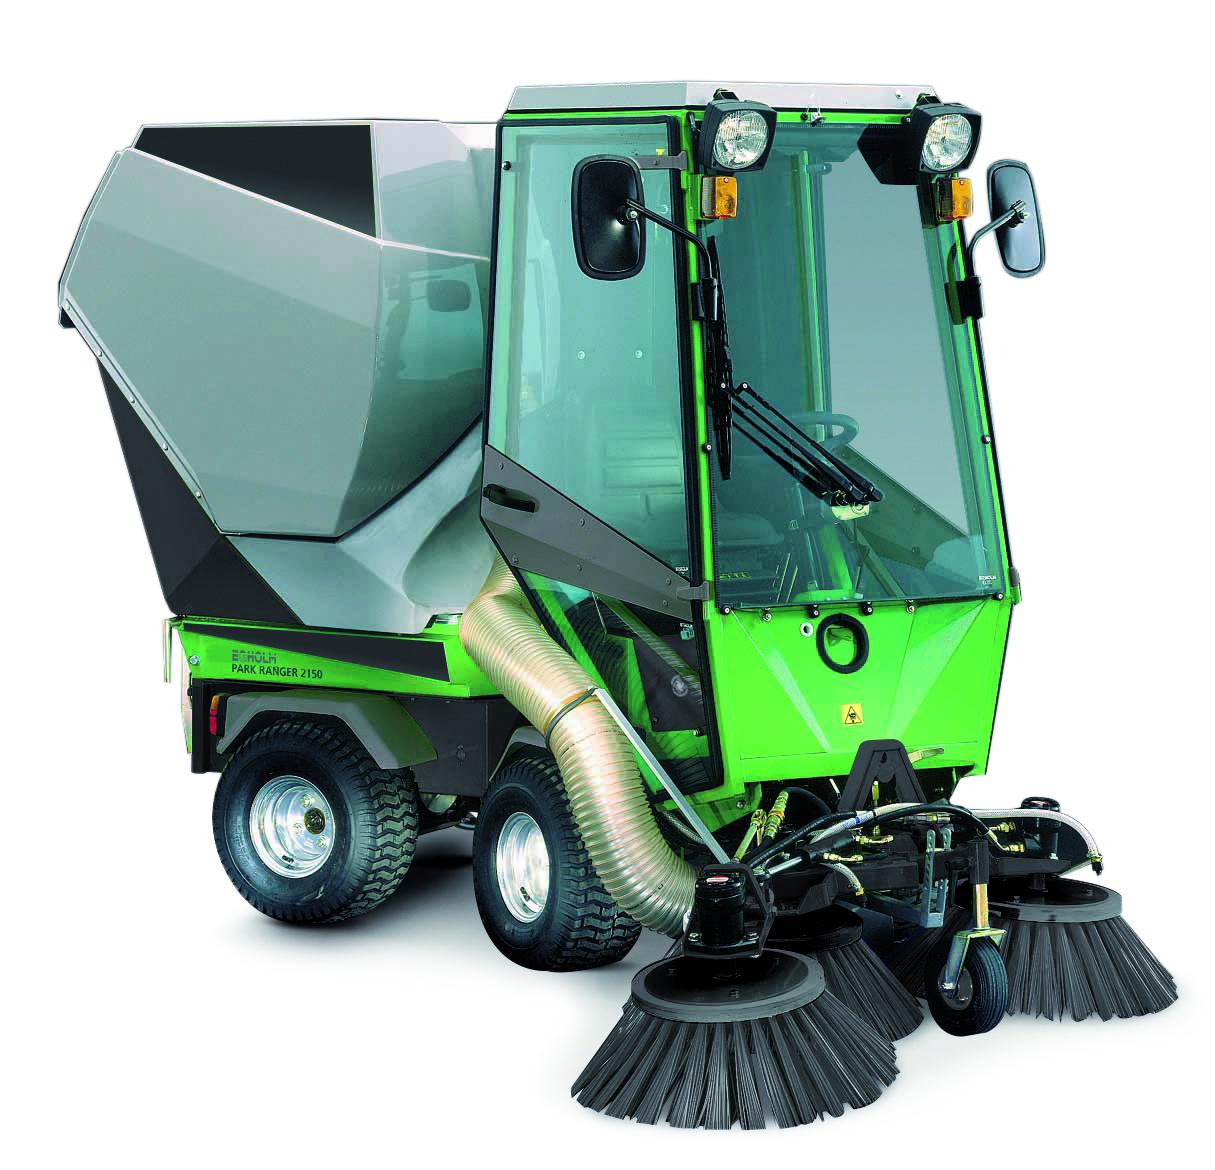 Egholm Park Ranger 2150 Geräteträger für Reinigungsunternehmen